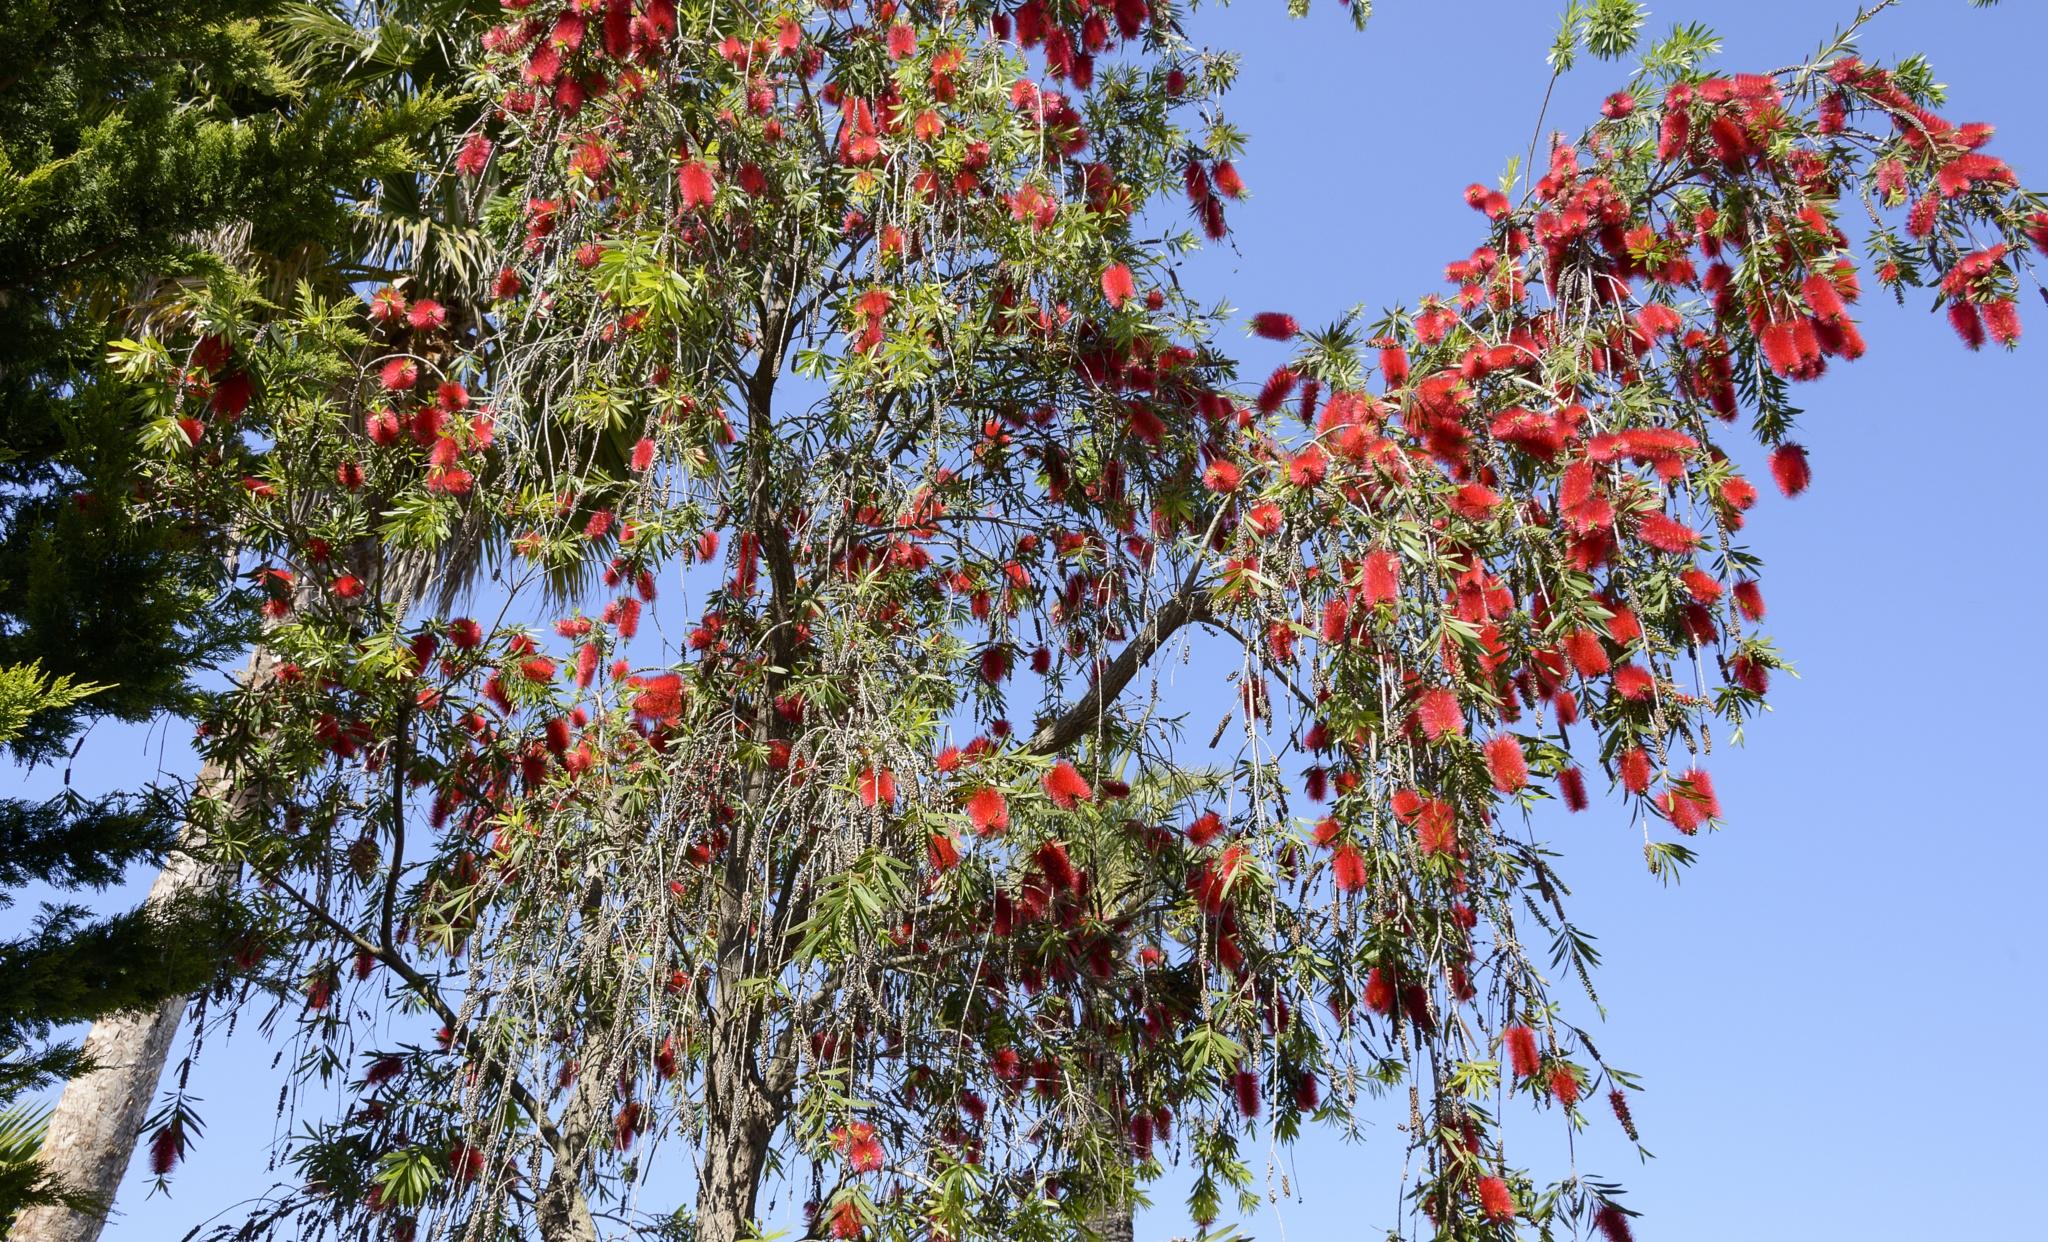 Flower tree by Jose Manuel Navarro